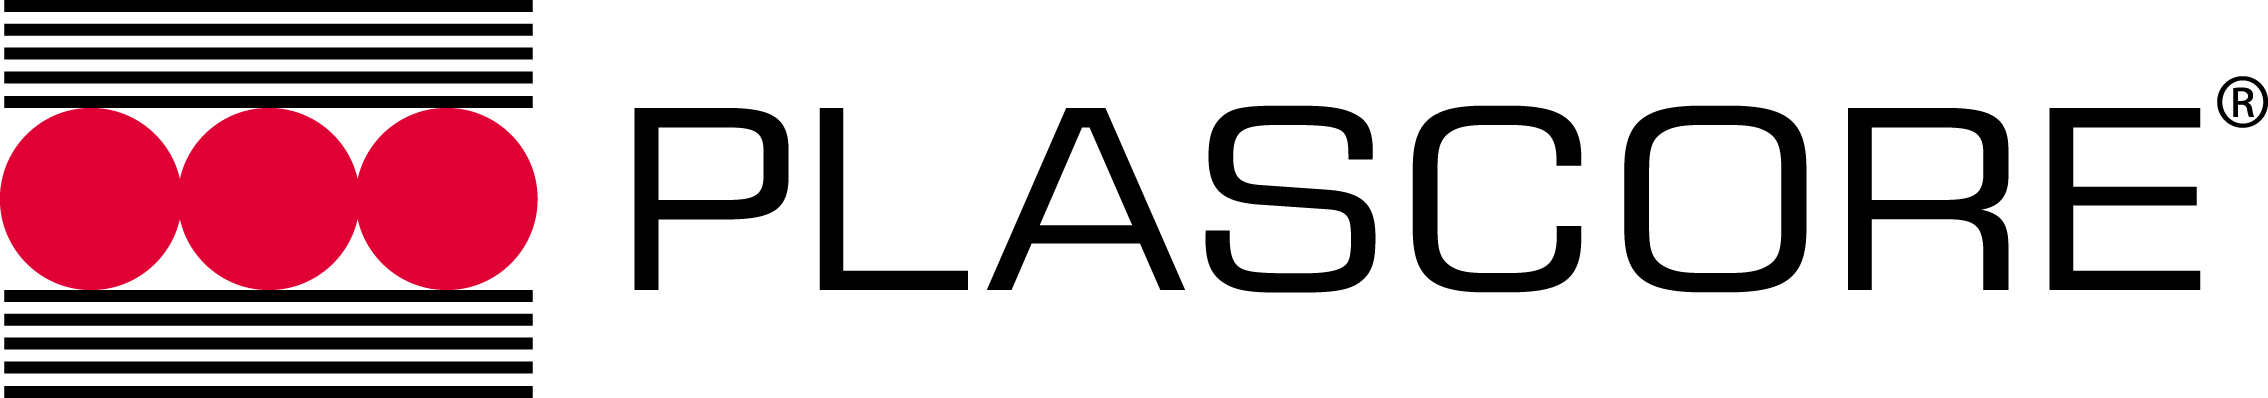 Image result for Plascore GmbH & Co. KG